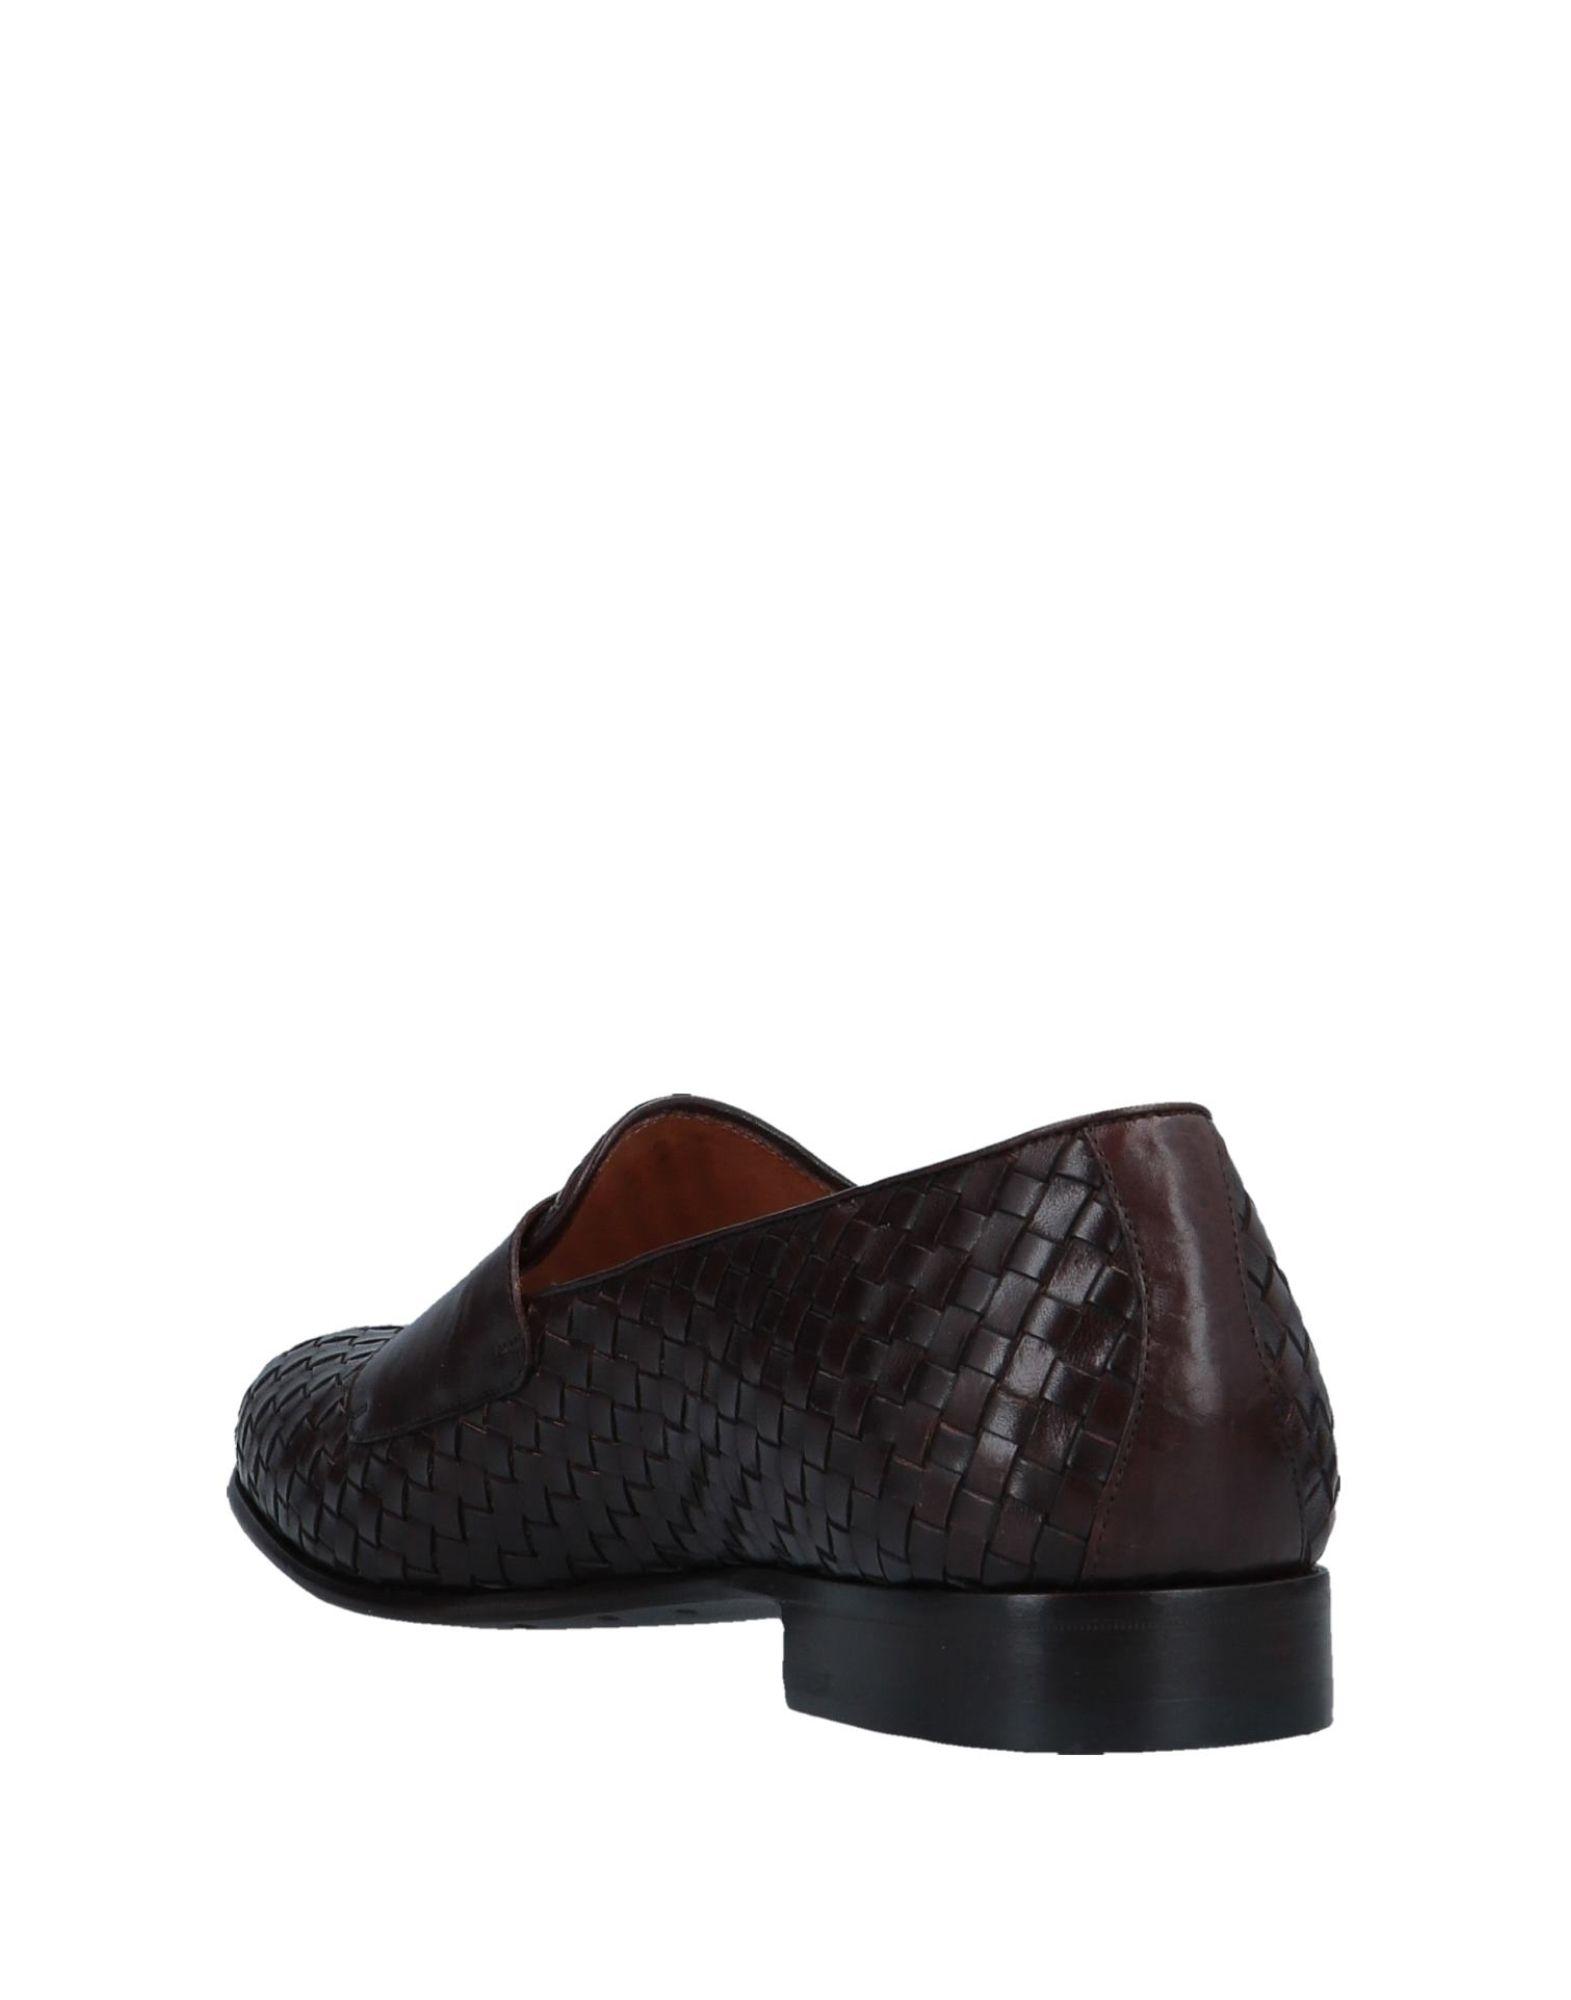 Artios Mokassins Herren beliebte  11550885CM Gute Qualität beliebte Herren Schuhe 173624